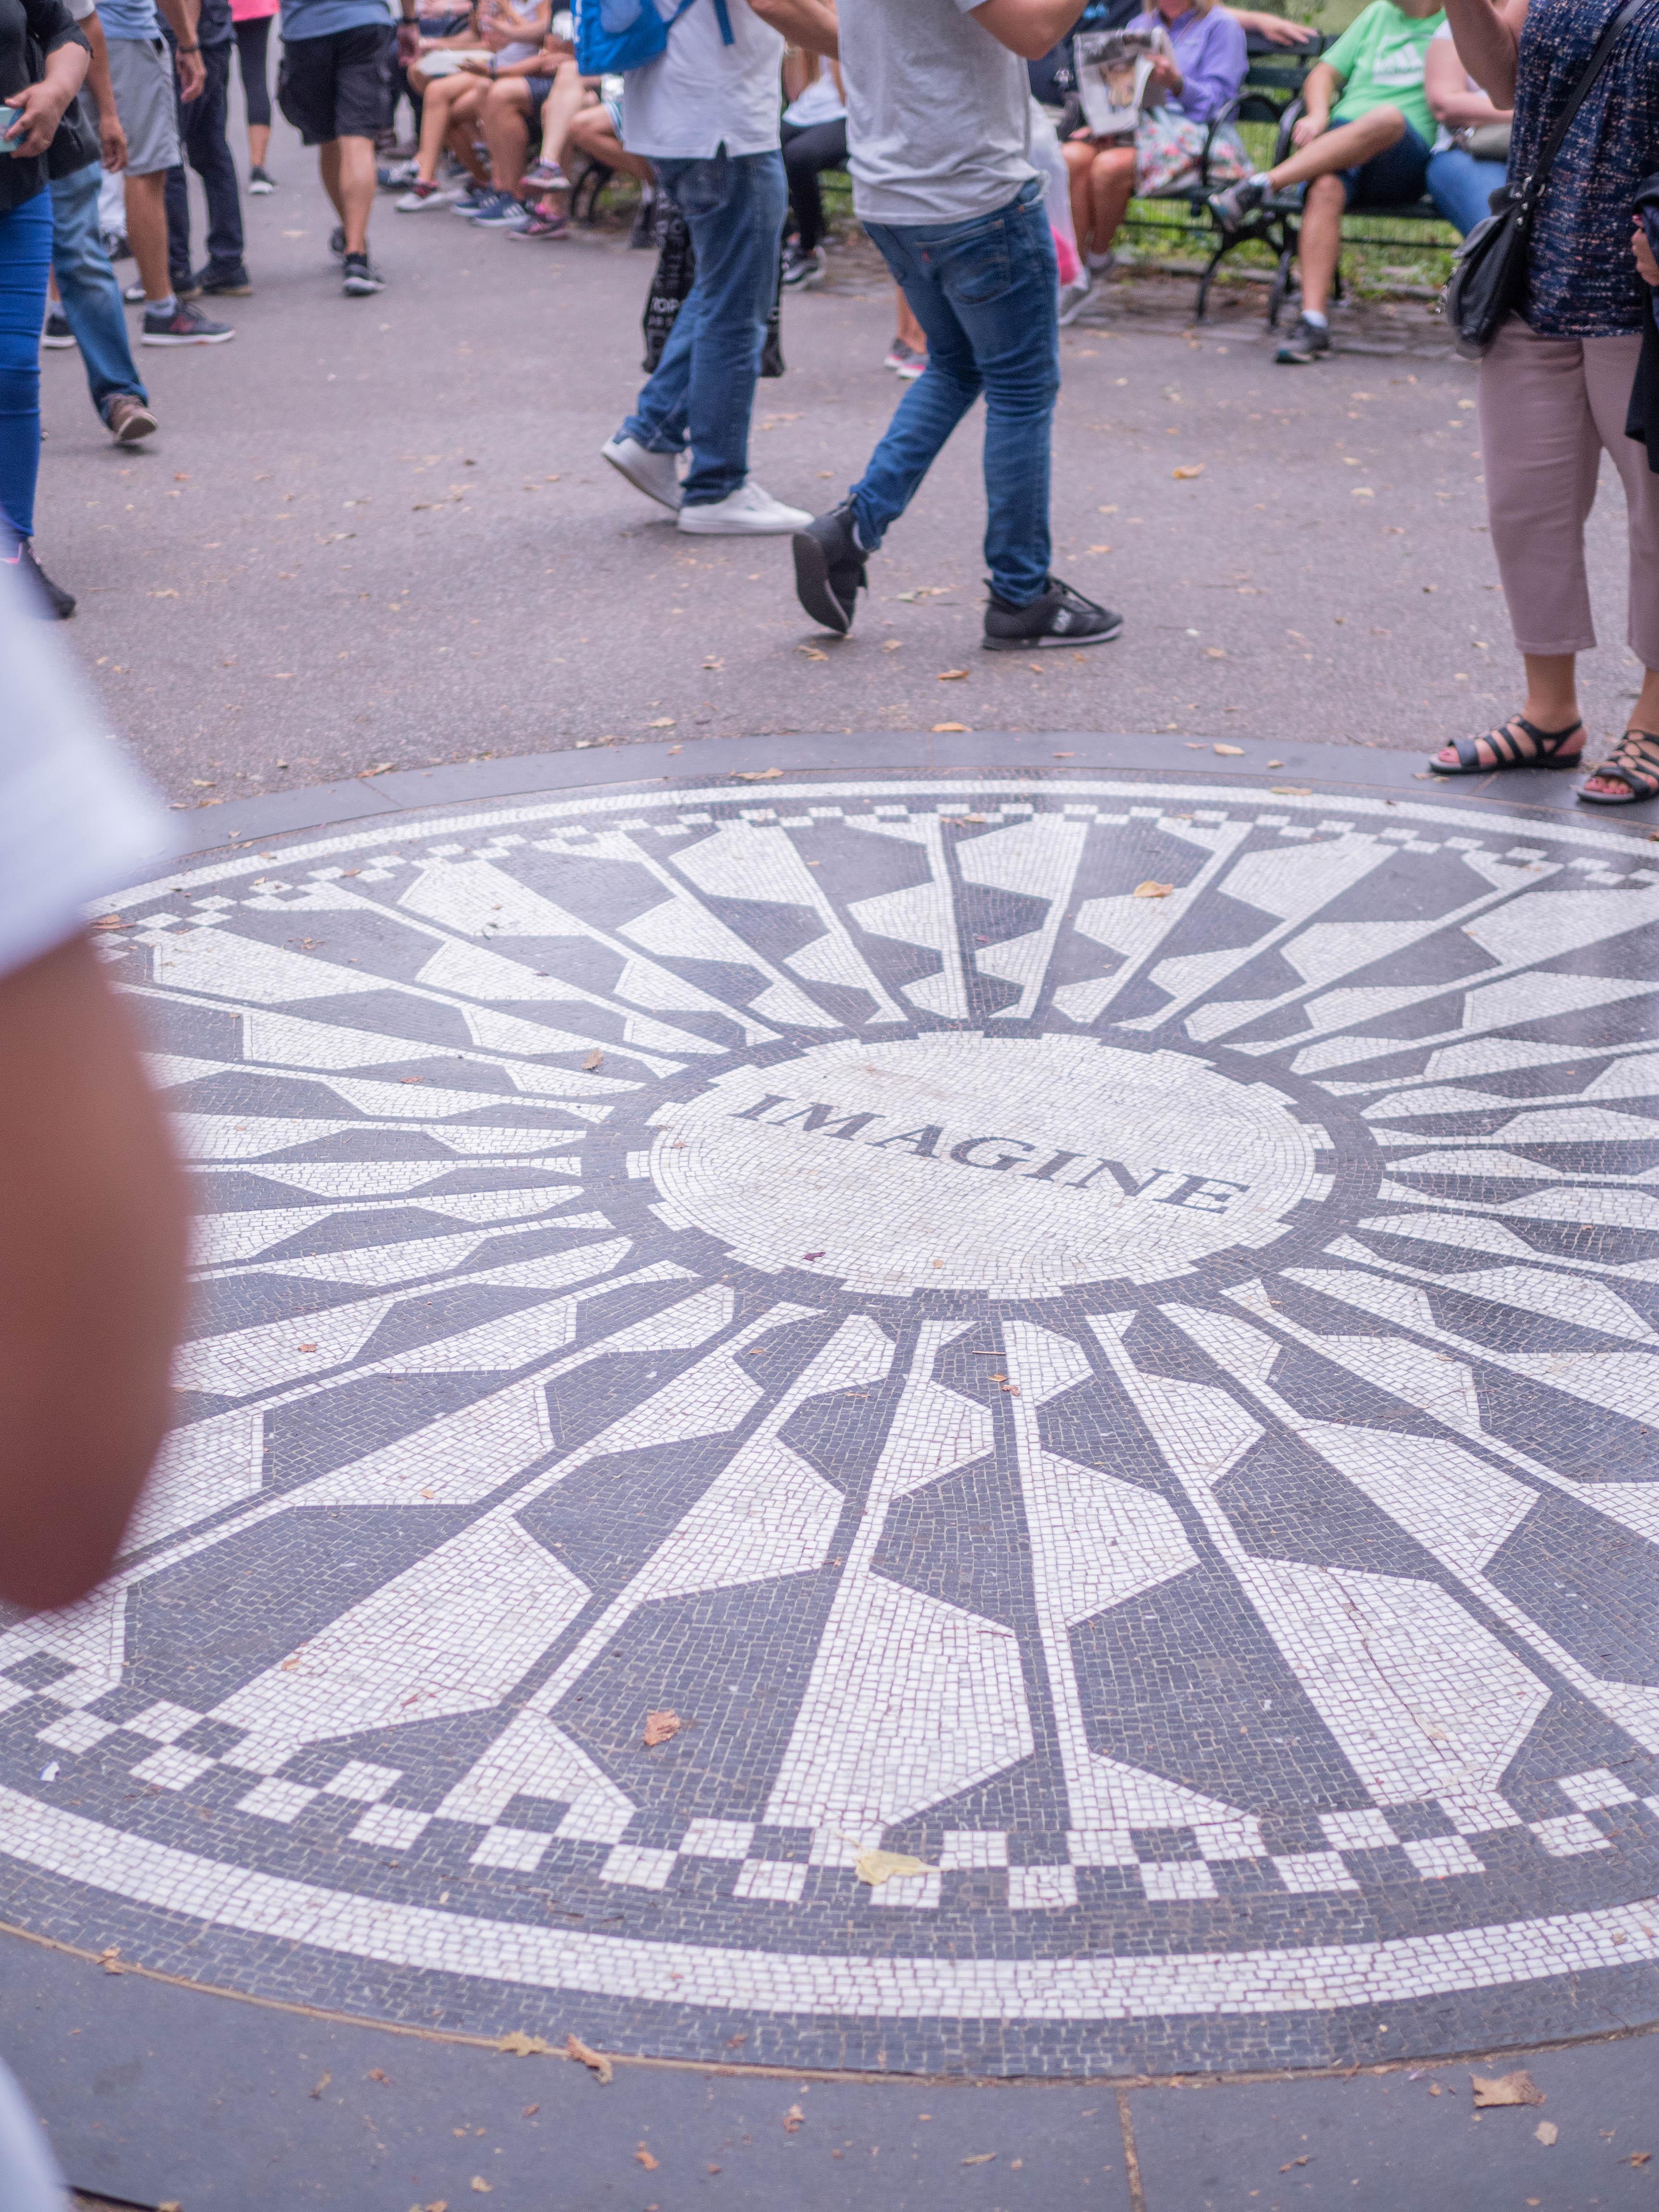 Strawberry Fields, inspired by John Lennon